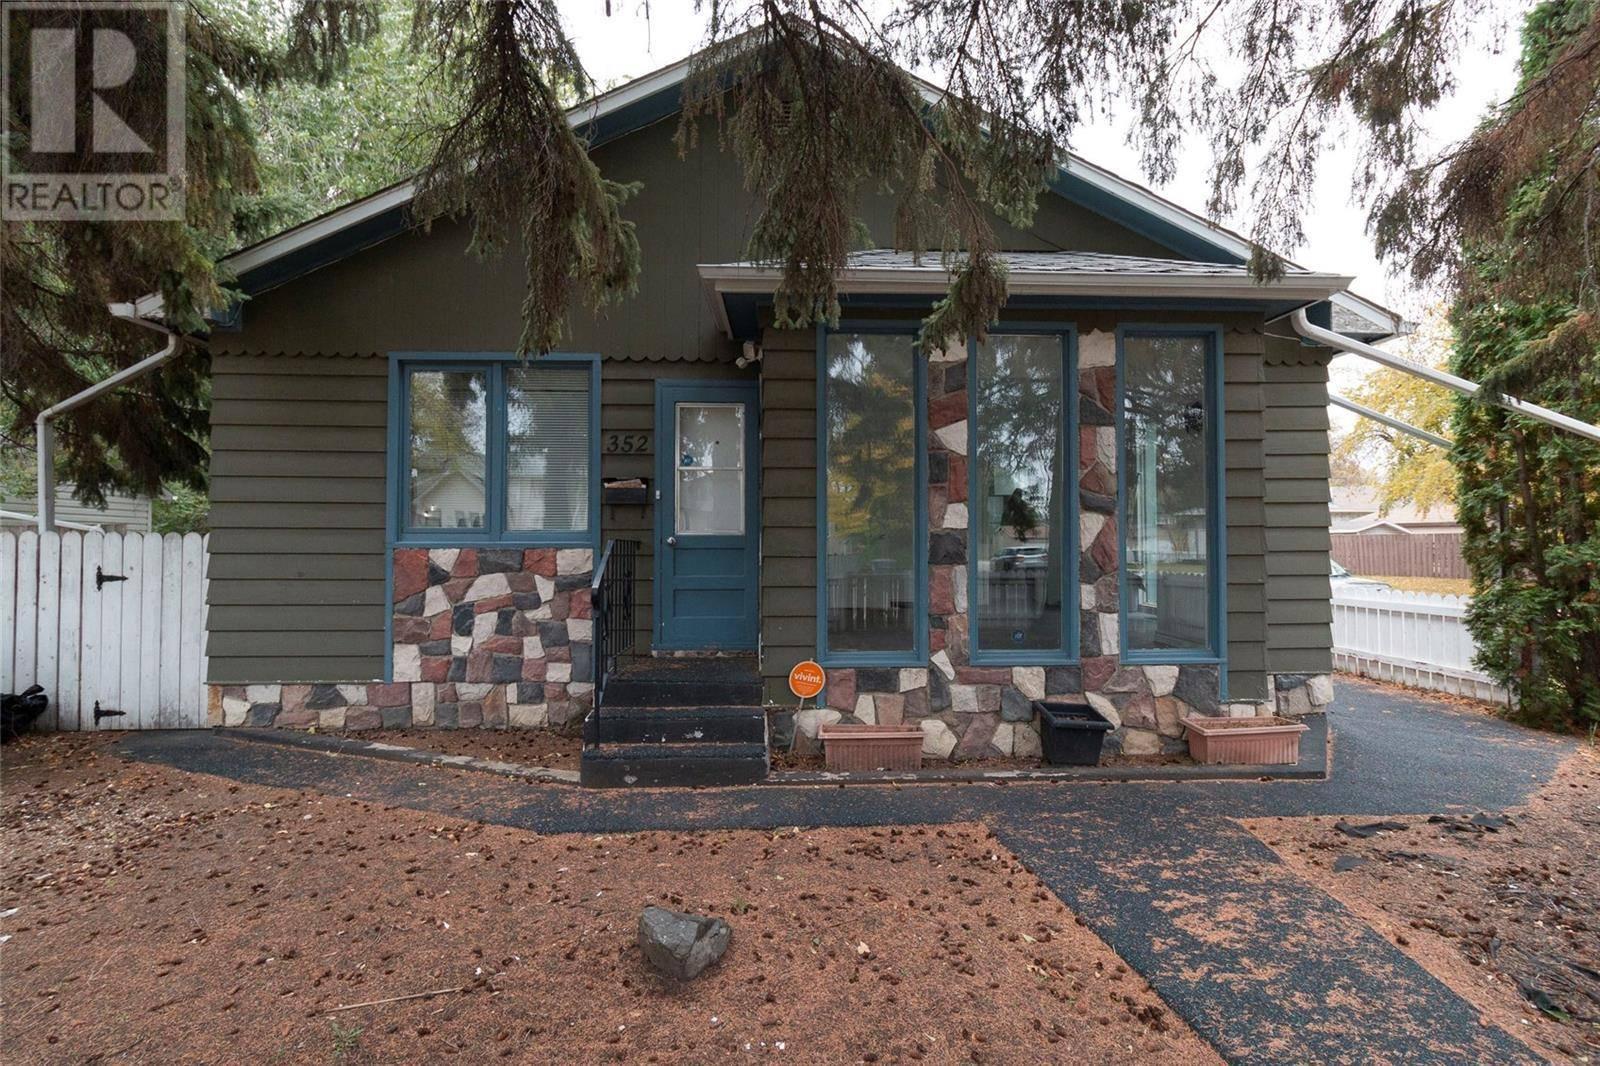 House for sale at 352 U Ave S Saskatoon Saskatchewan - MLS: SK789022